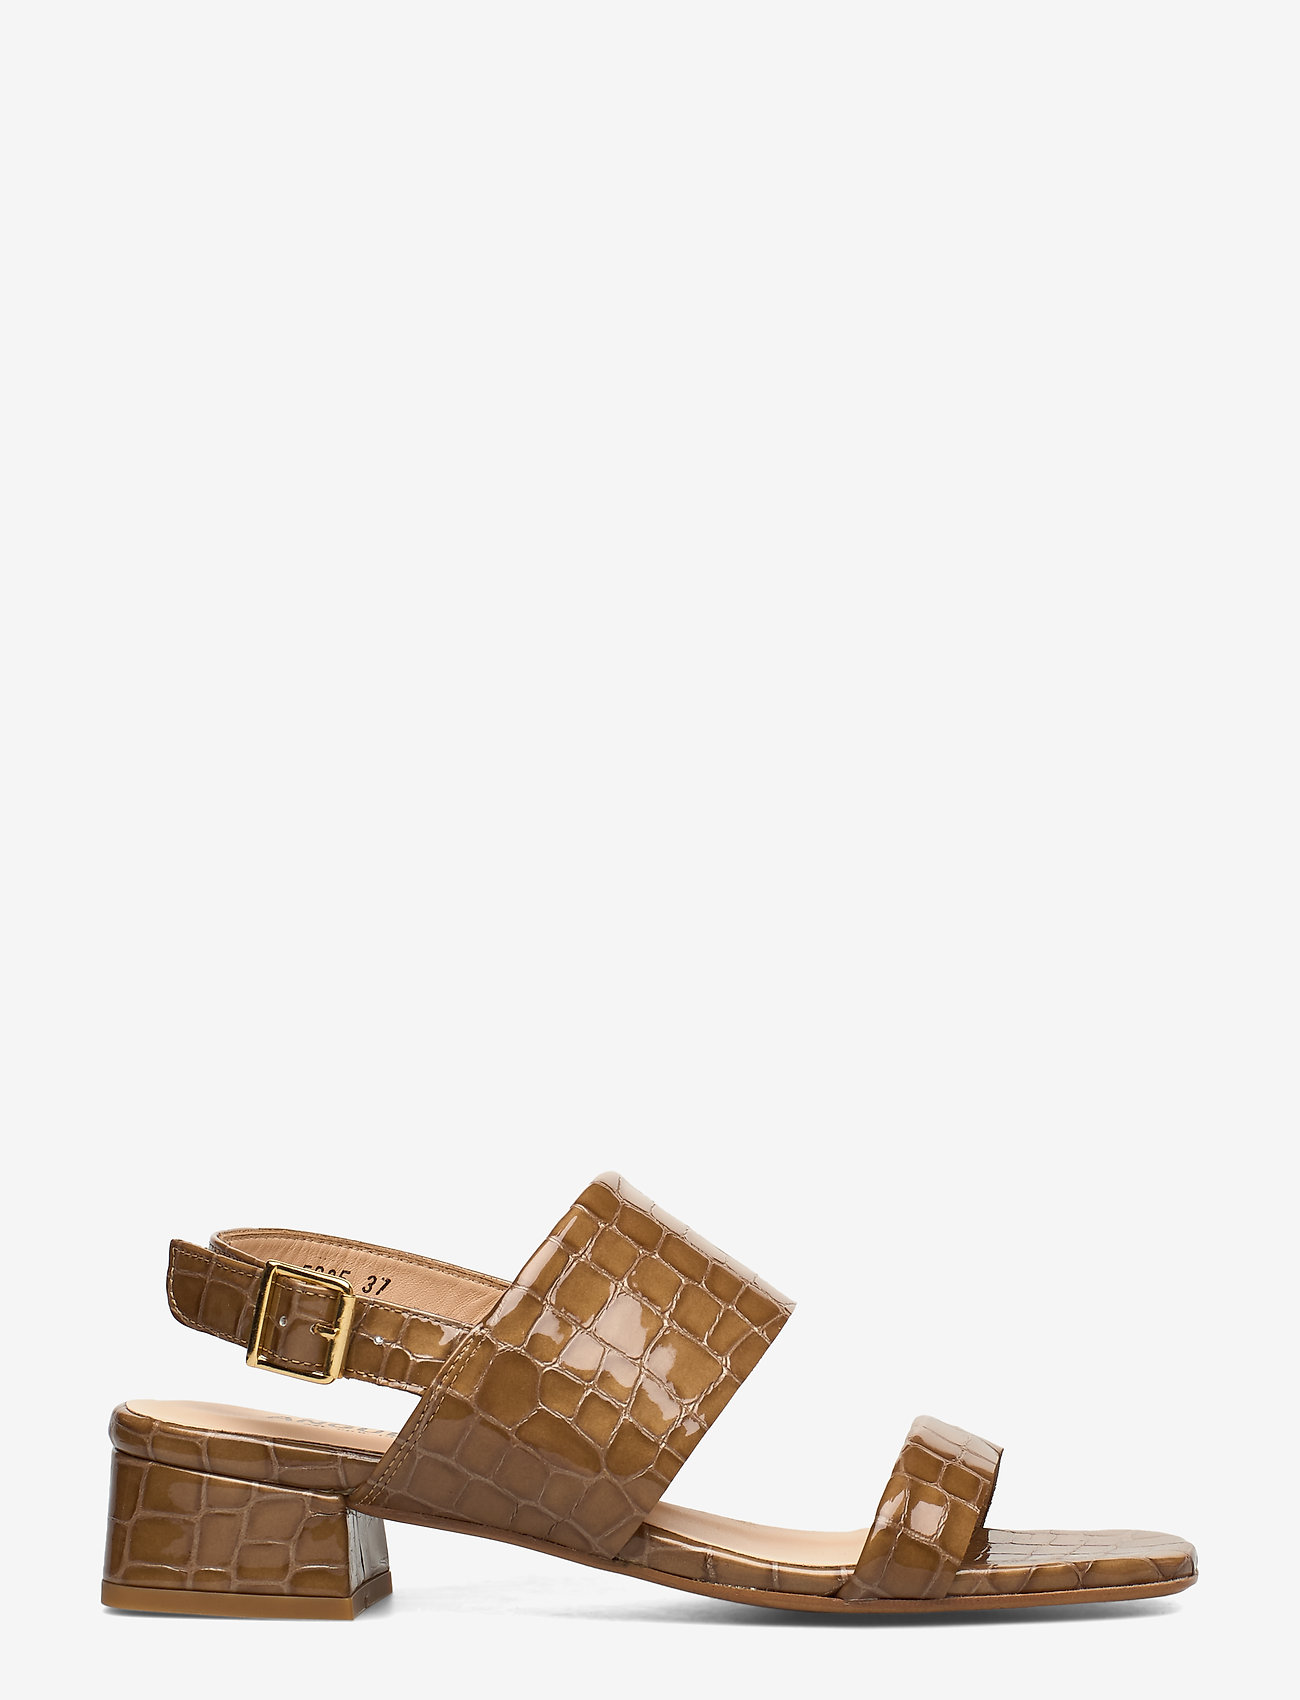 ANGULUS - Sandals - Block heels - højhælede sandaler - 1671 tan krokodille - 1